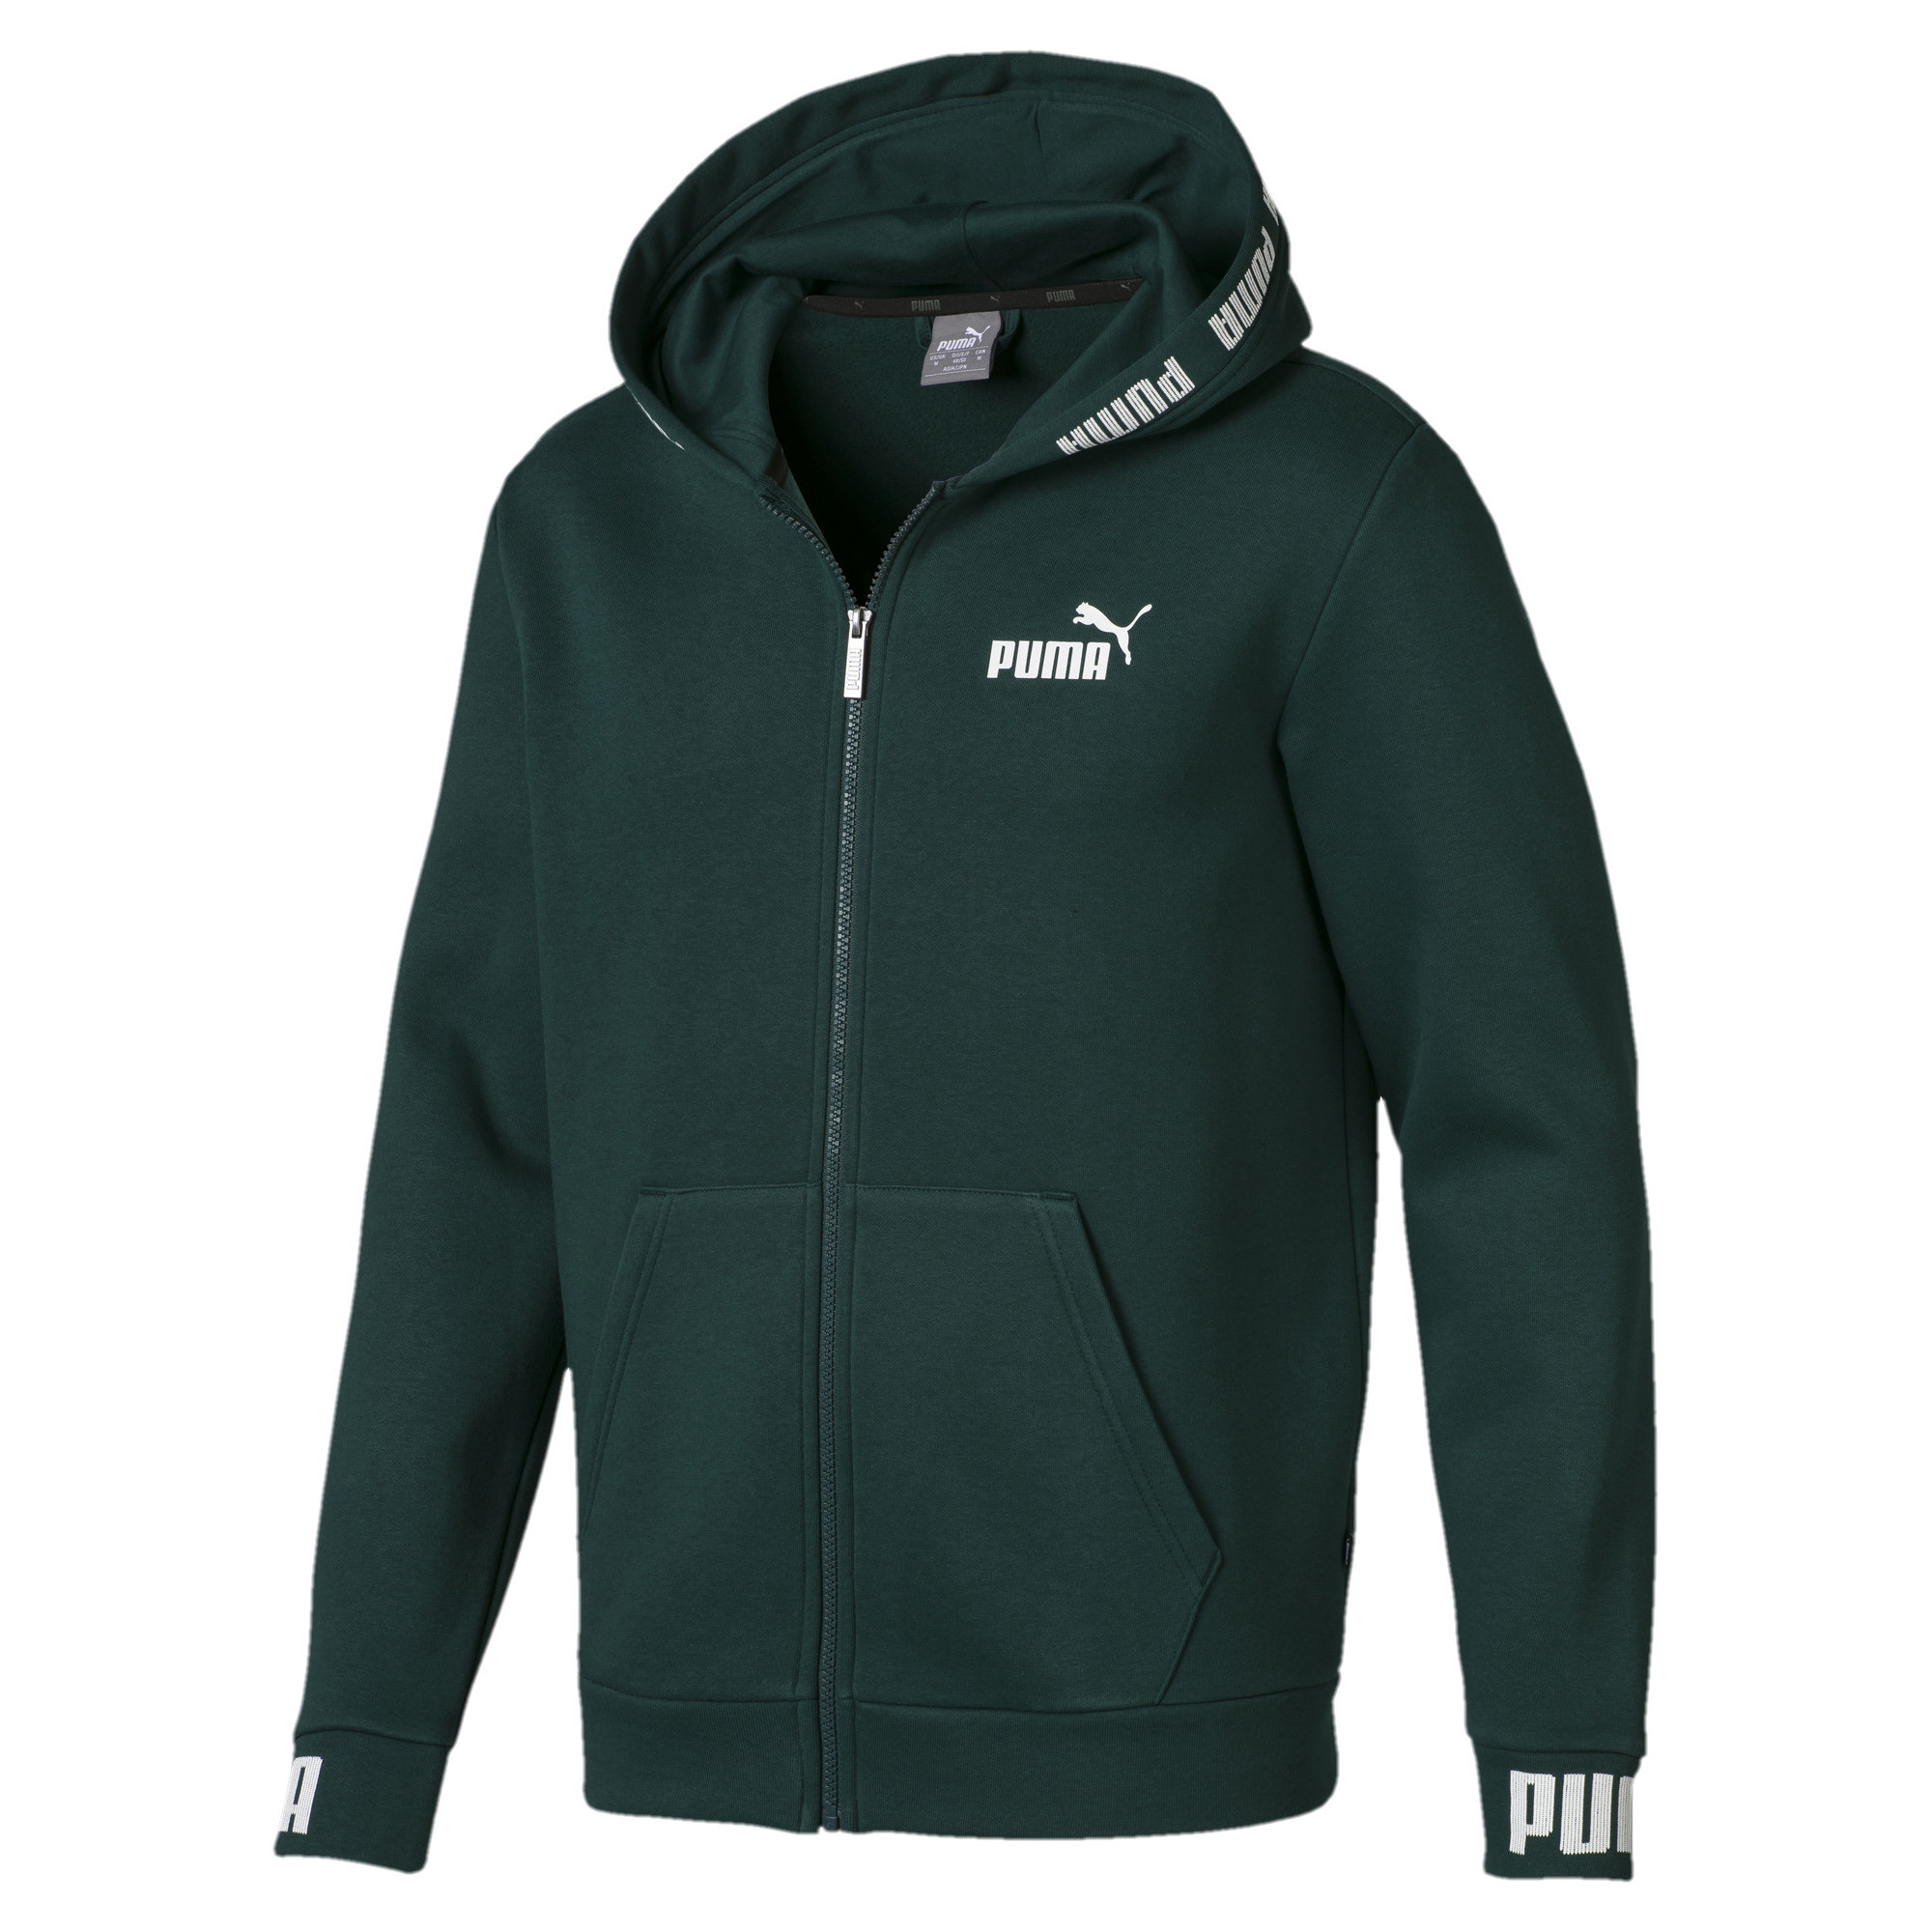 Image Puma Amplified Men's Hooded Fleece Jacket #1